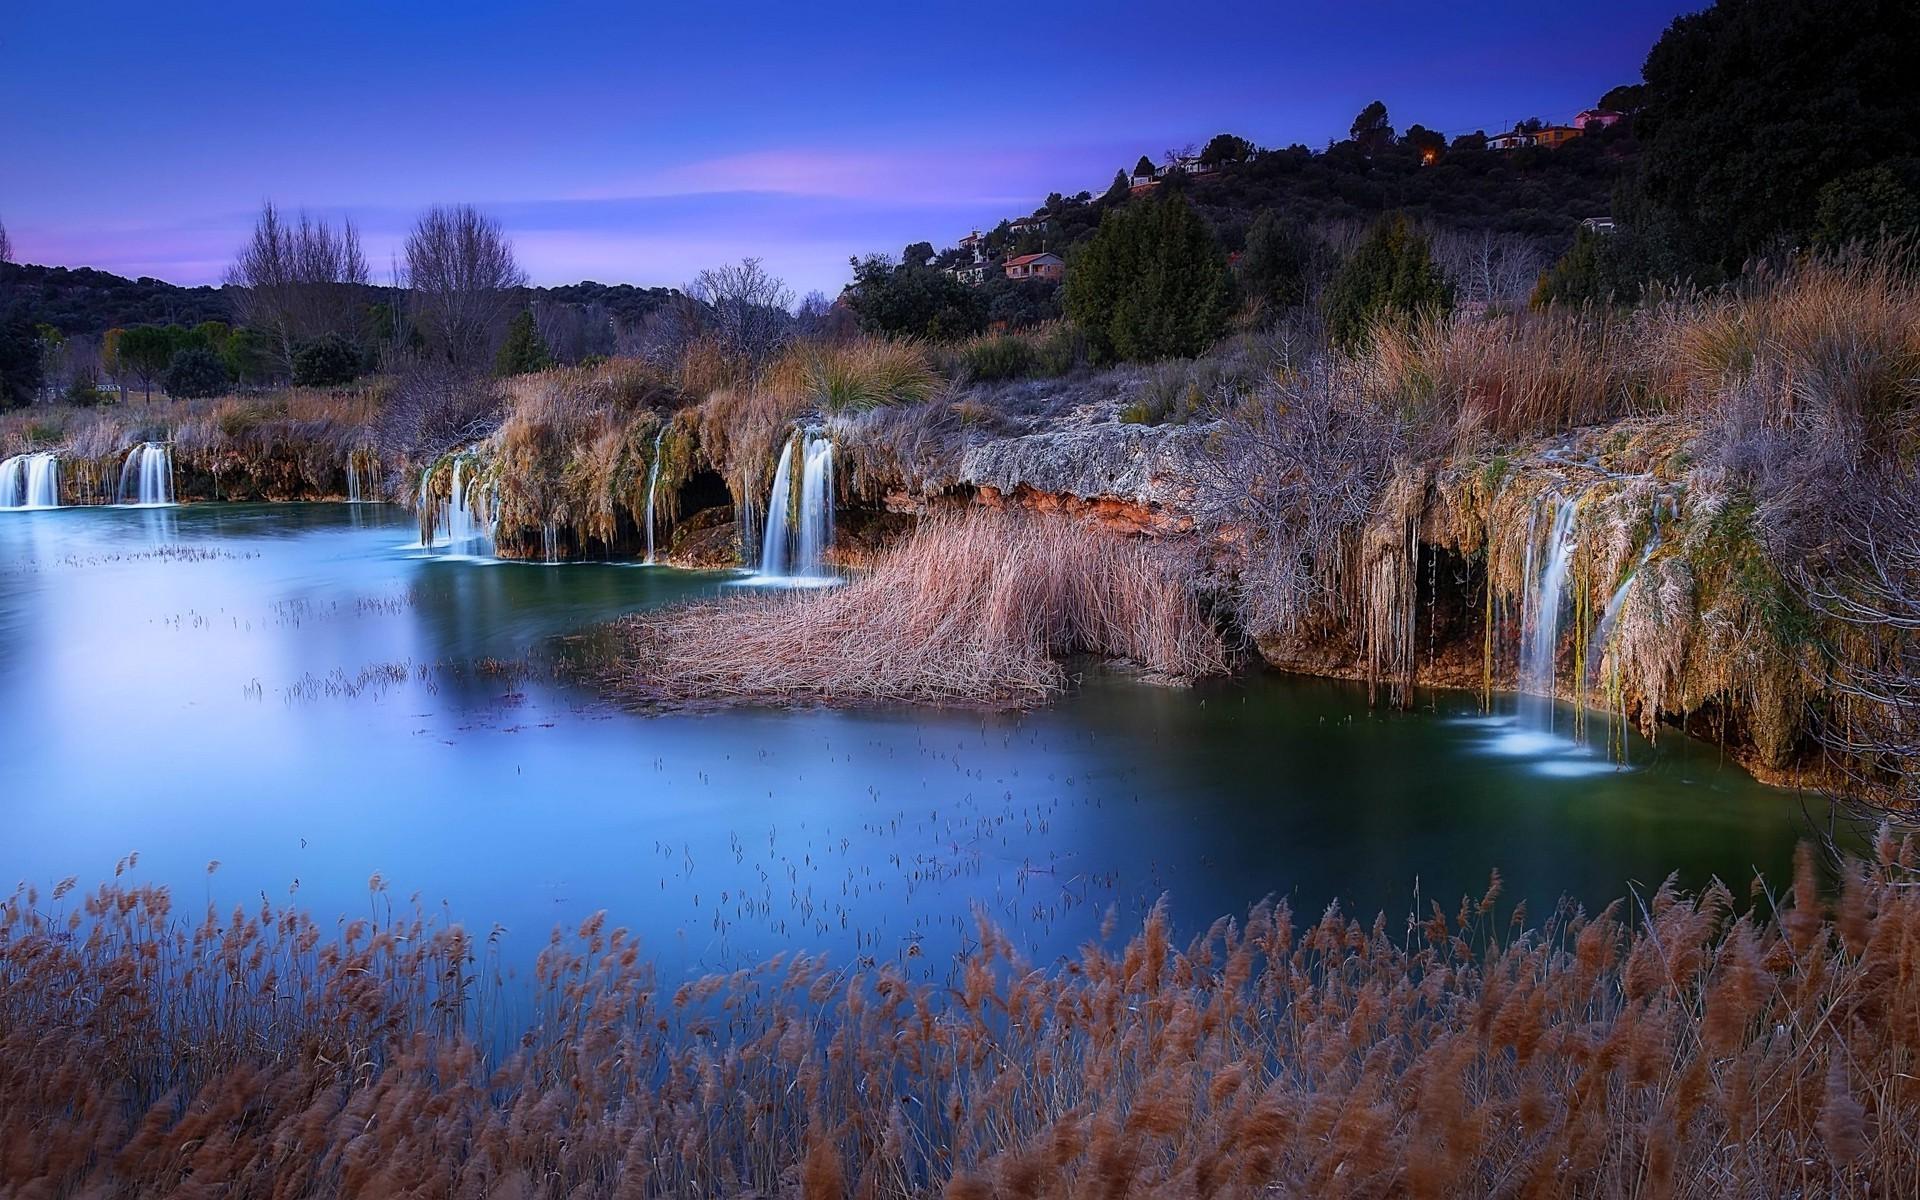 5760x1080 Anime Wallpaper Landscape Nature Evening Lake Waterfall Hill Village